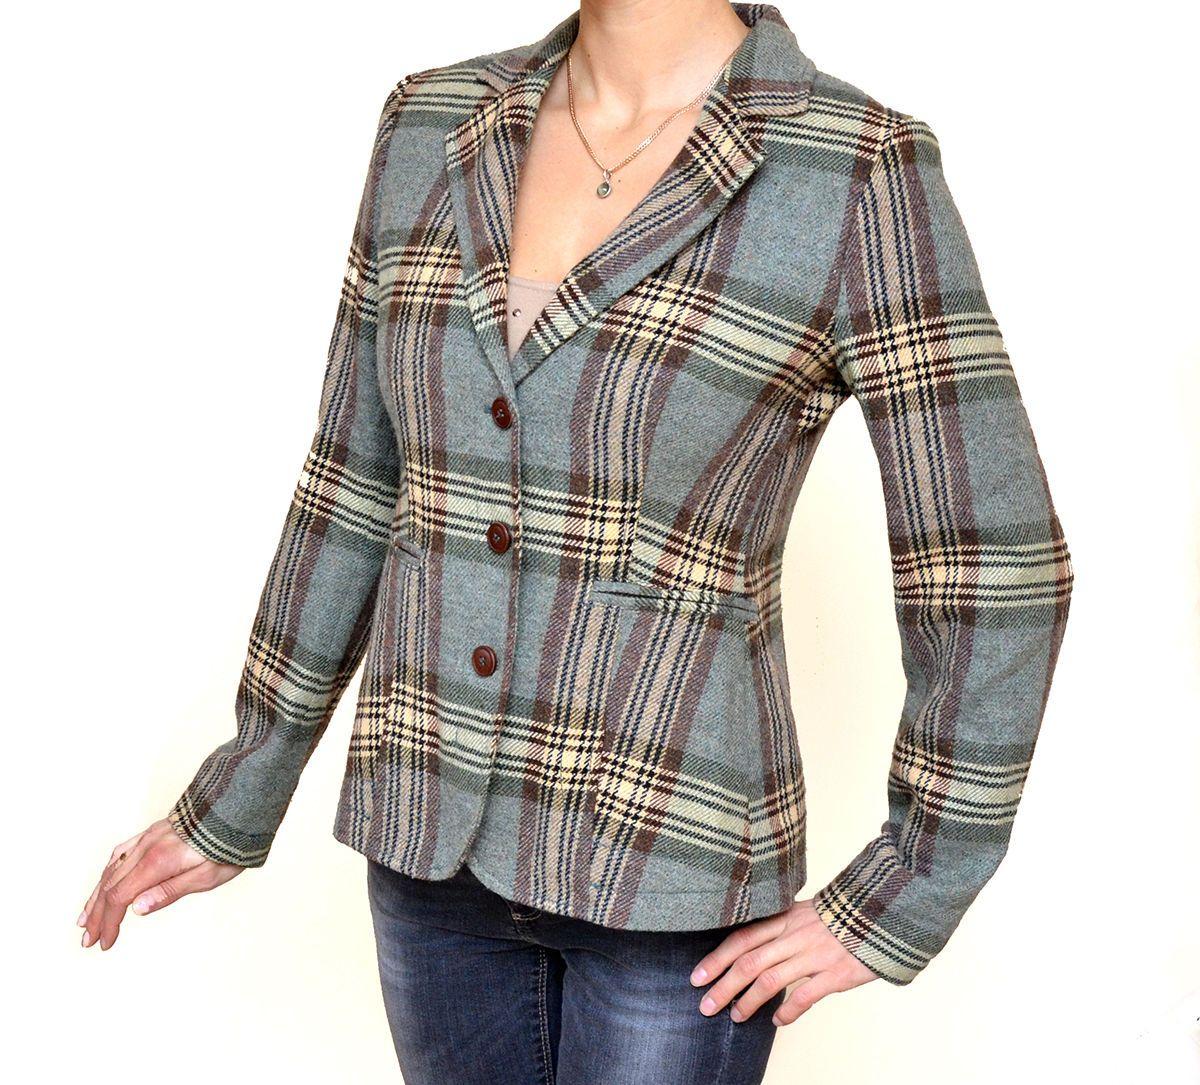 Auth Women's ETRO Multi Color Wool Jacket Blazer 44 US 8   eBay